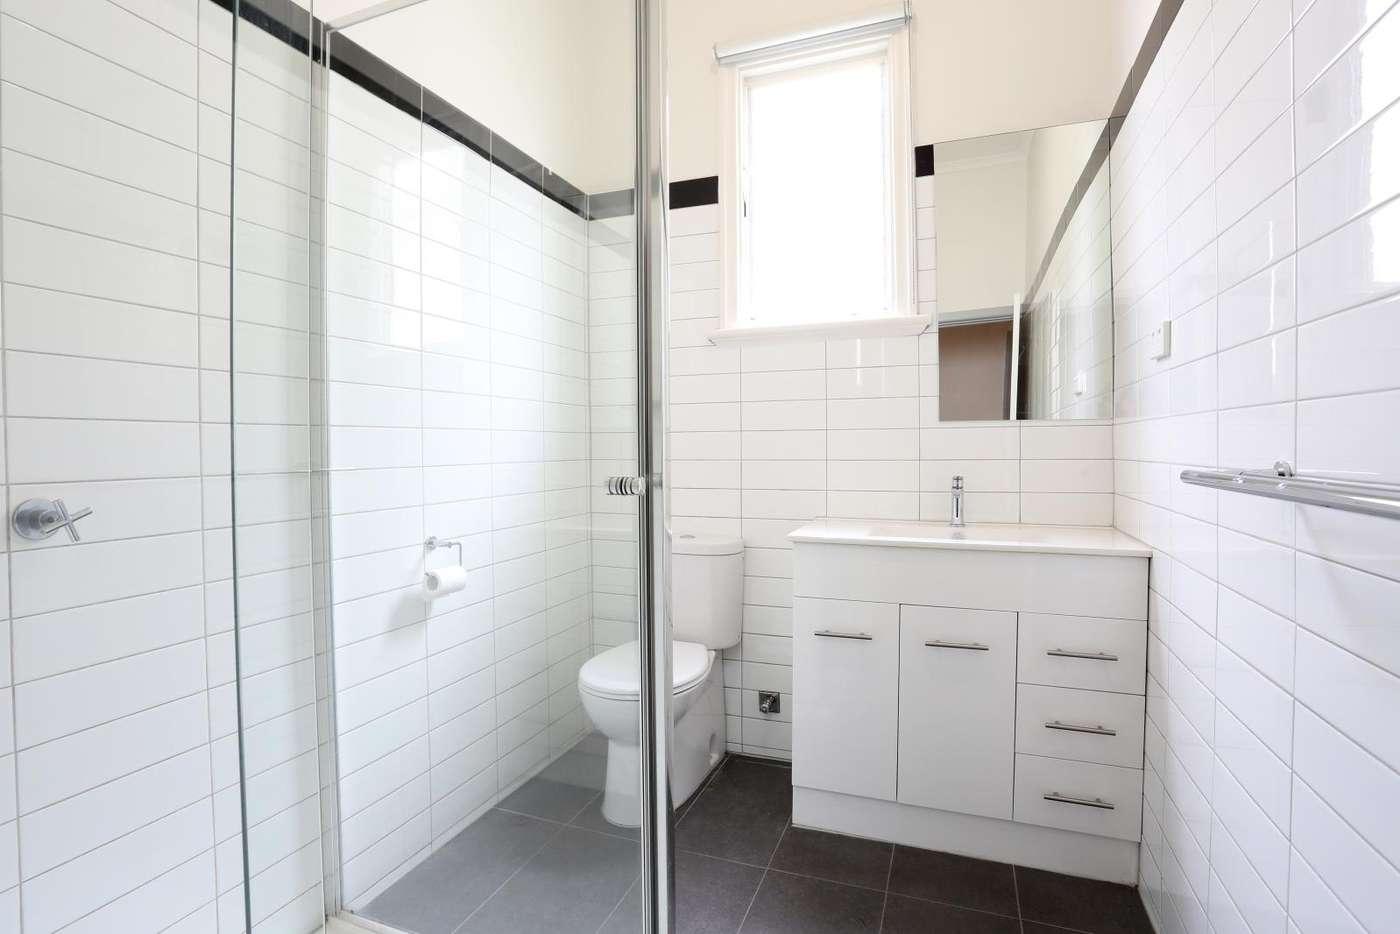 Sixth view of Homely house listing, 9 Salisbury Street, Coburg VIC 3058